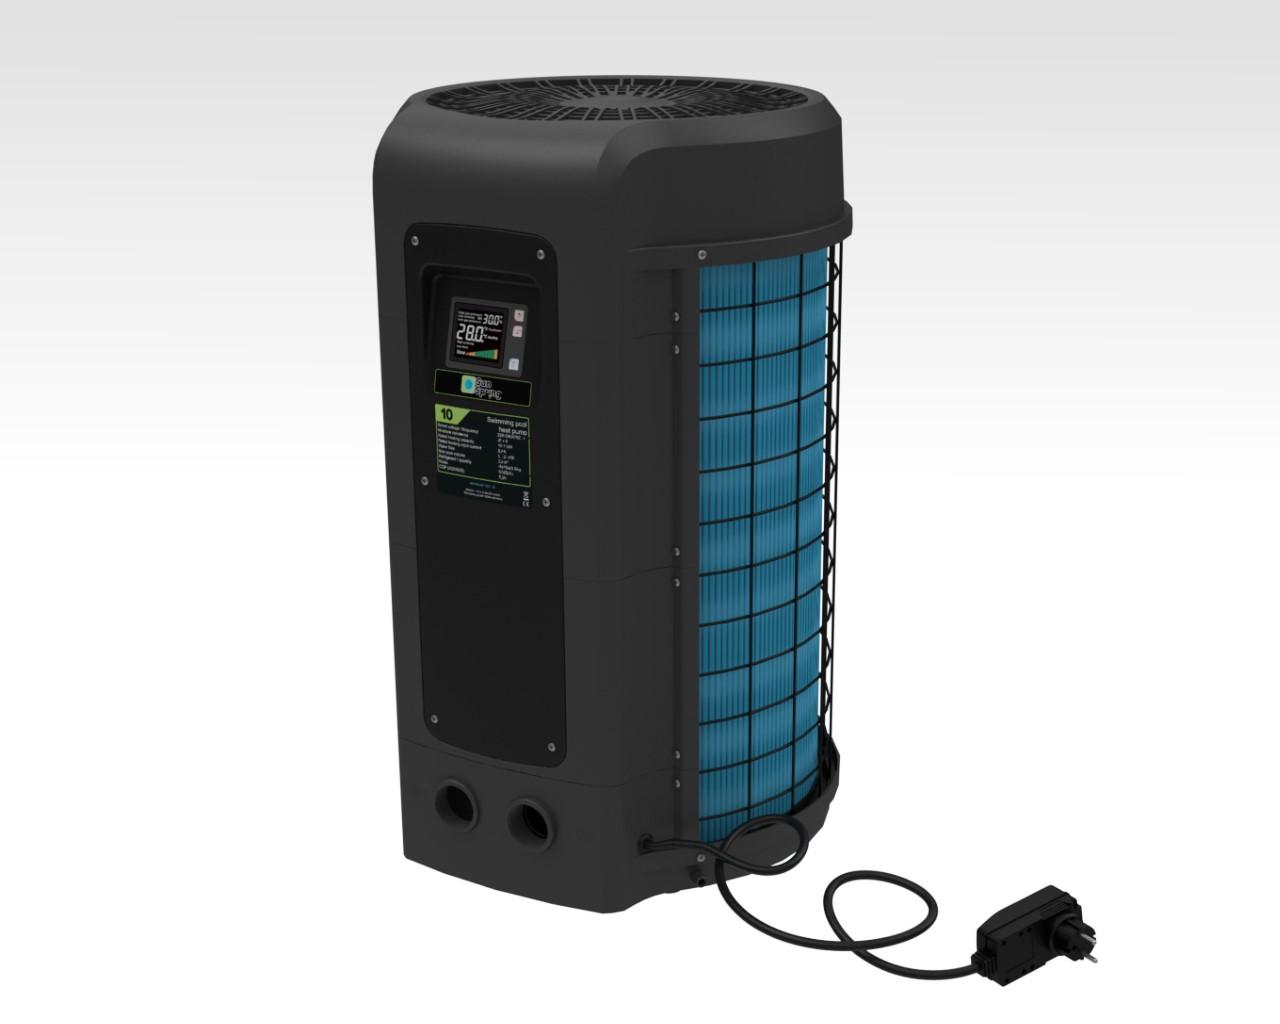 Wärmepumpe SunSpring 14 Plug & Play 13,7 KW Heizleistung